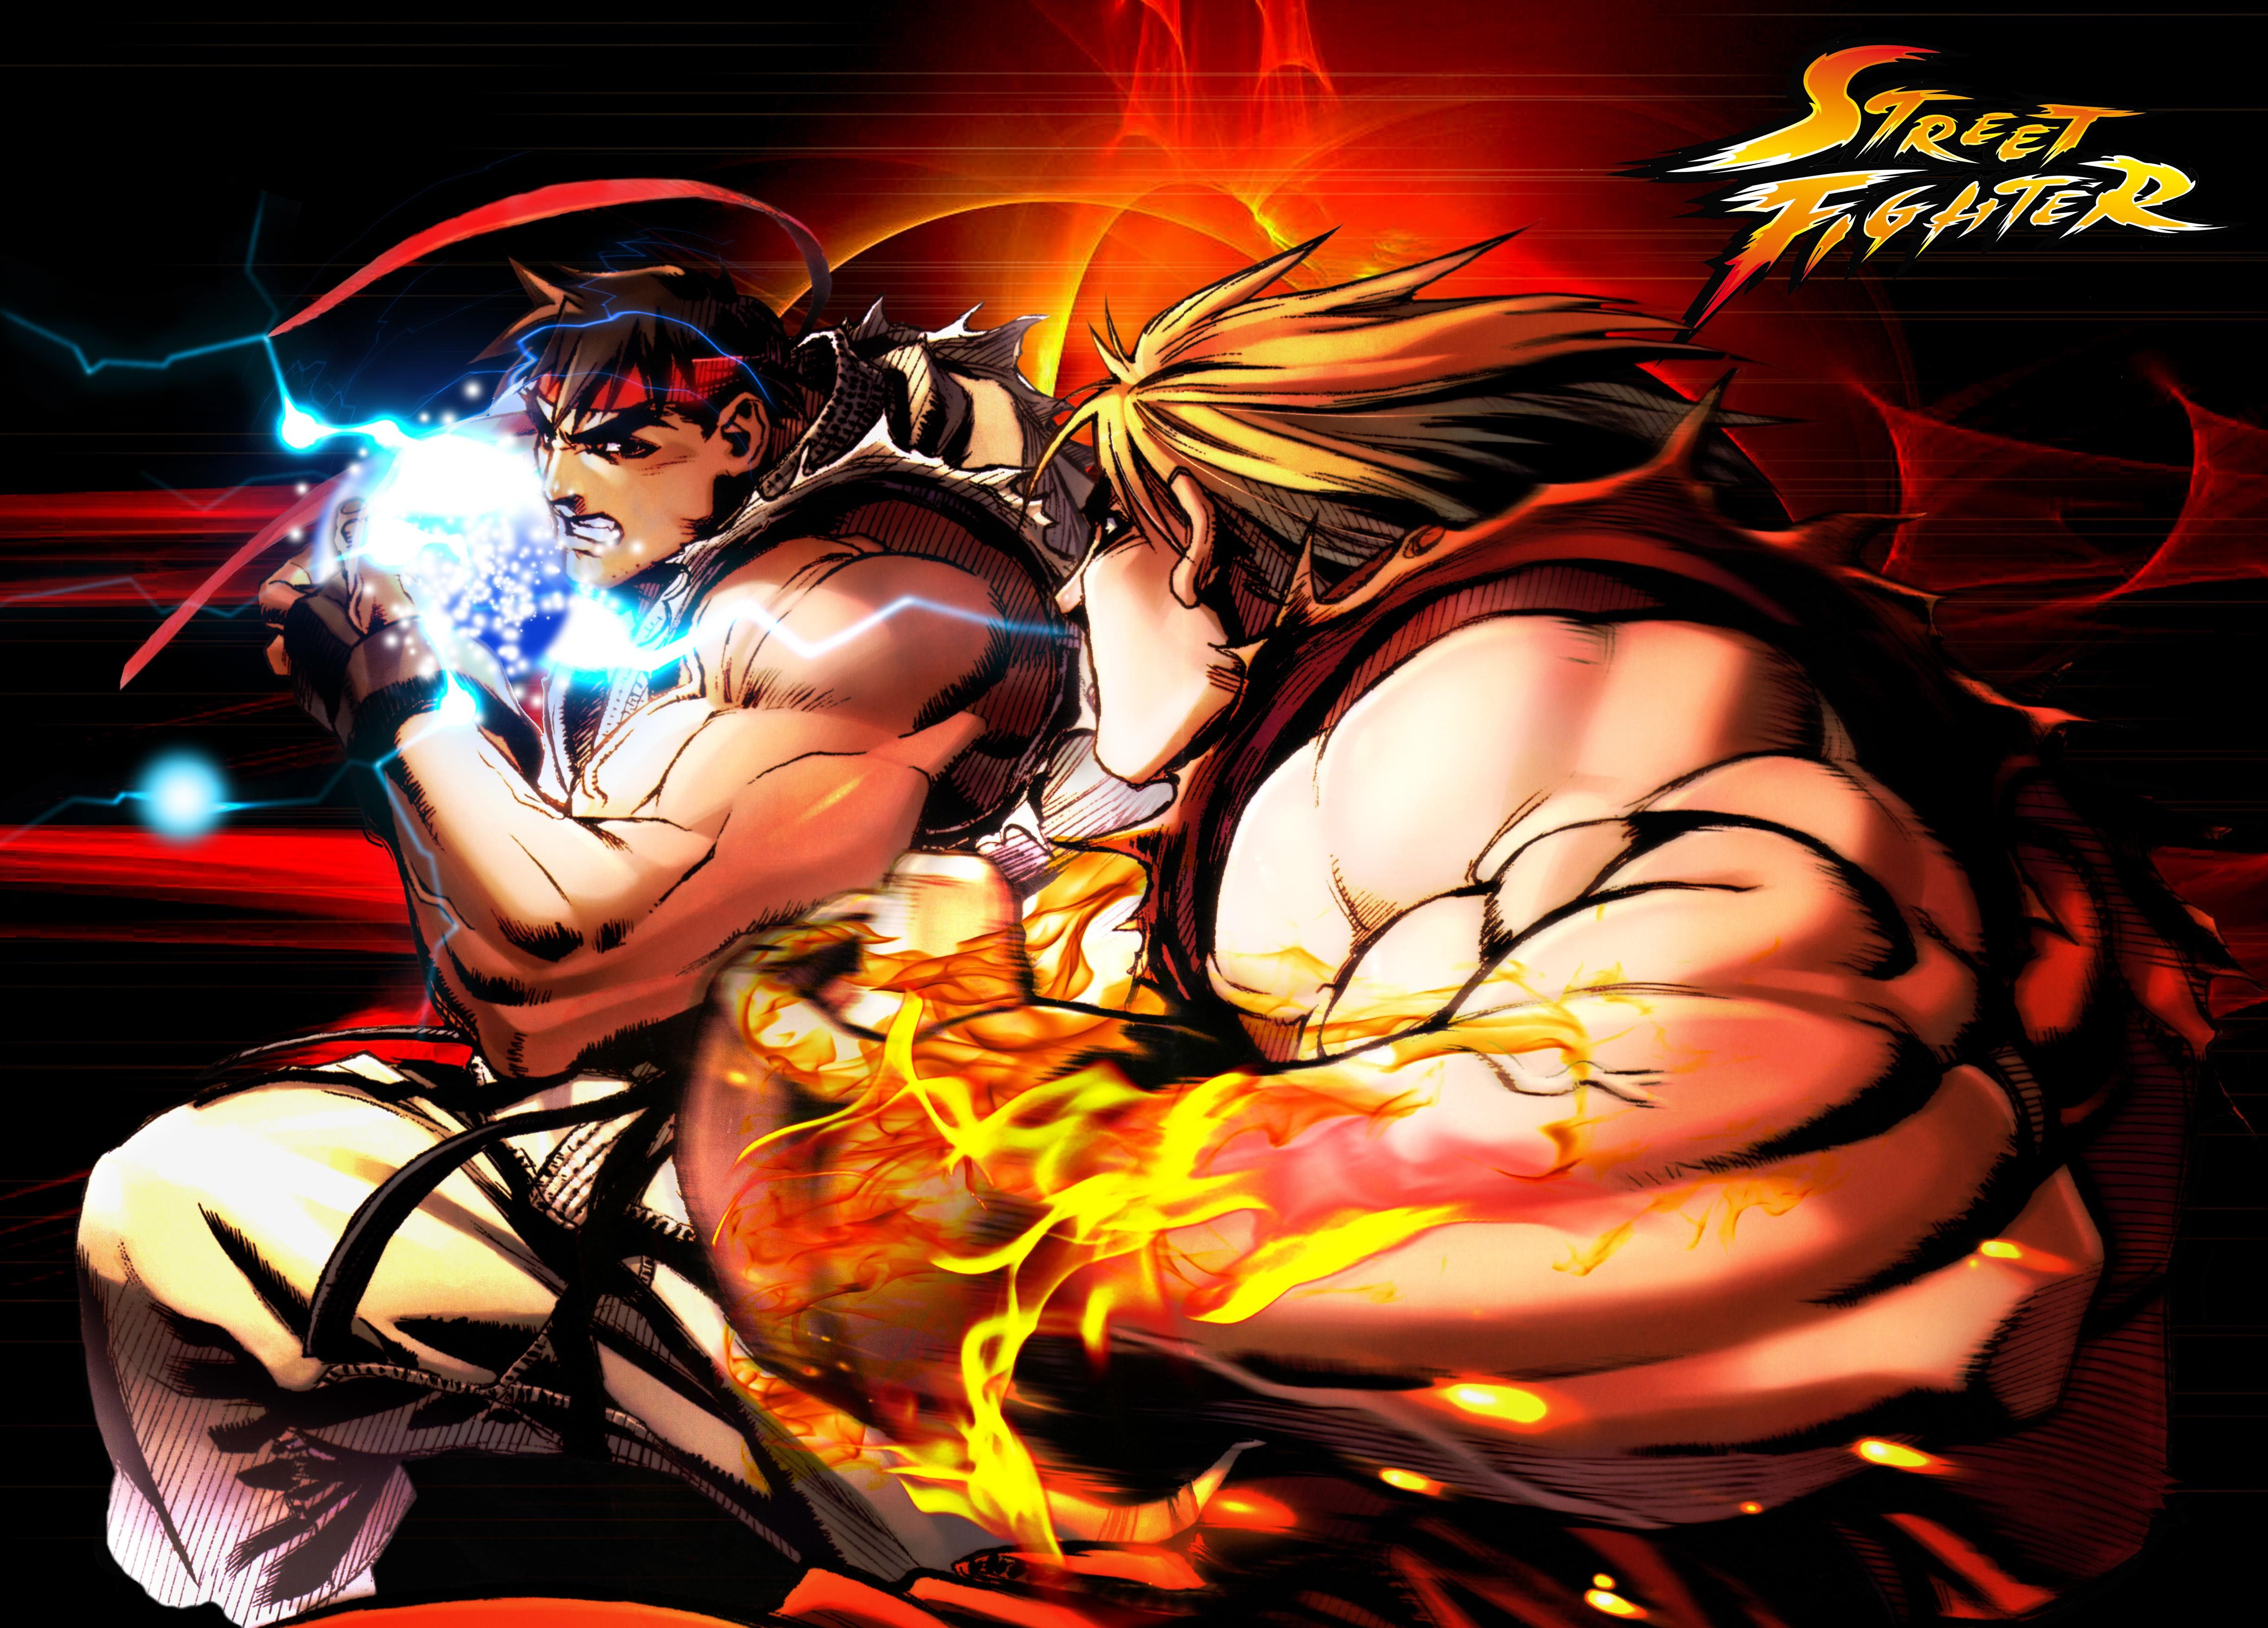 wallpaper : 4886x3508 px, ken street fighter, ryu street fighter